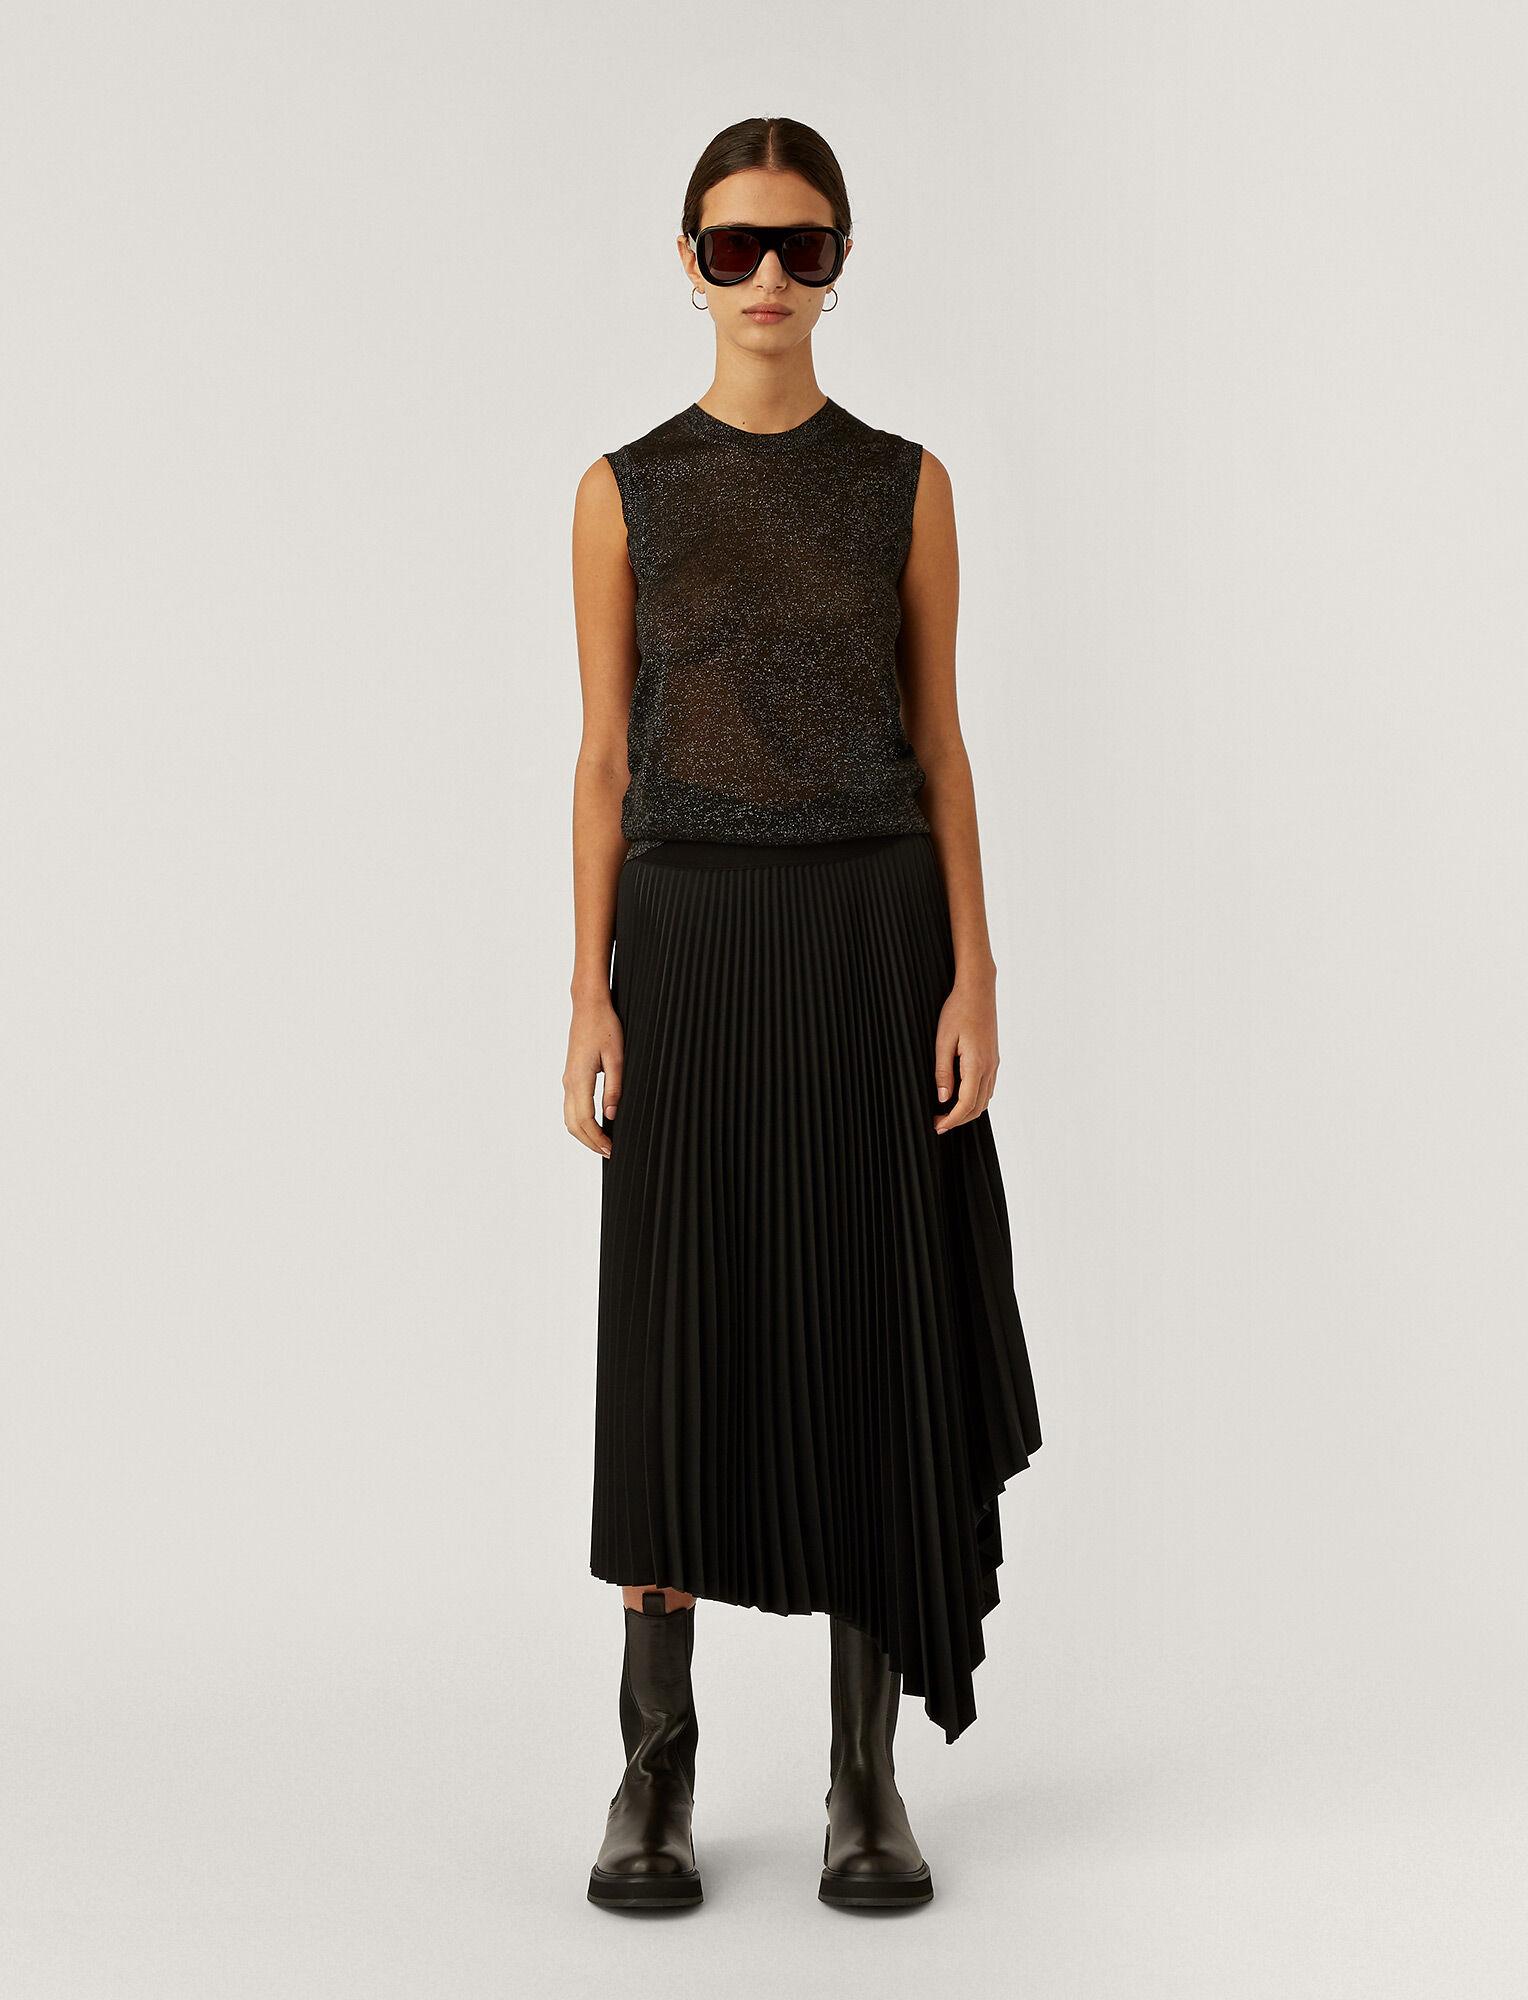 Joseph, Pleated Rib Swinton Skirt, in BLACK